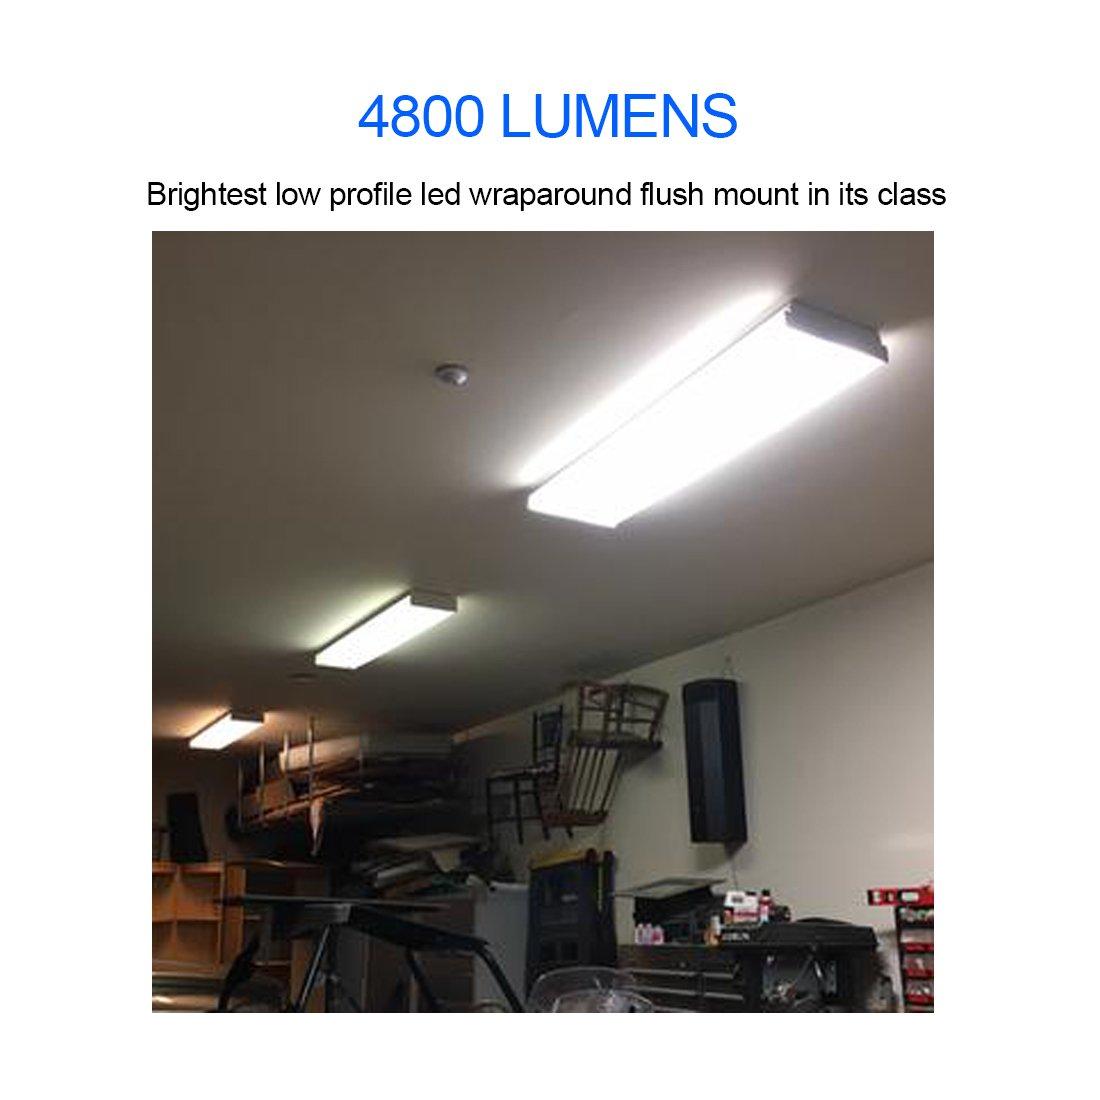 Antlux 4ft Led Garage Shop Lights Wraparound Light Fixture 50w Ac Powered Circuit 120w Flood Enkonn Technology Co Ltd 5500 Lumens 4000k Neutral White 4 Foot Integrated Low Profile Linear Flushmount